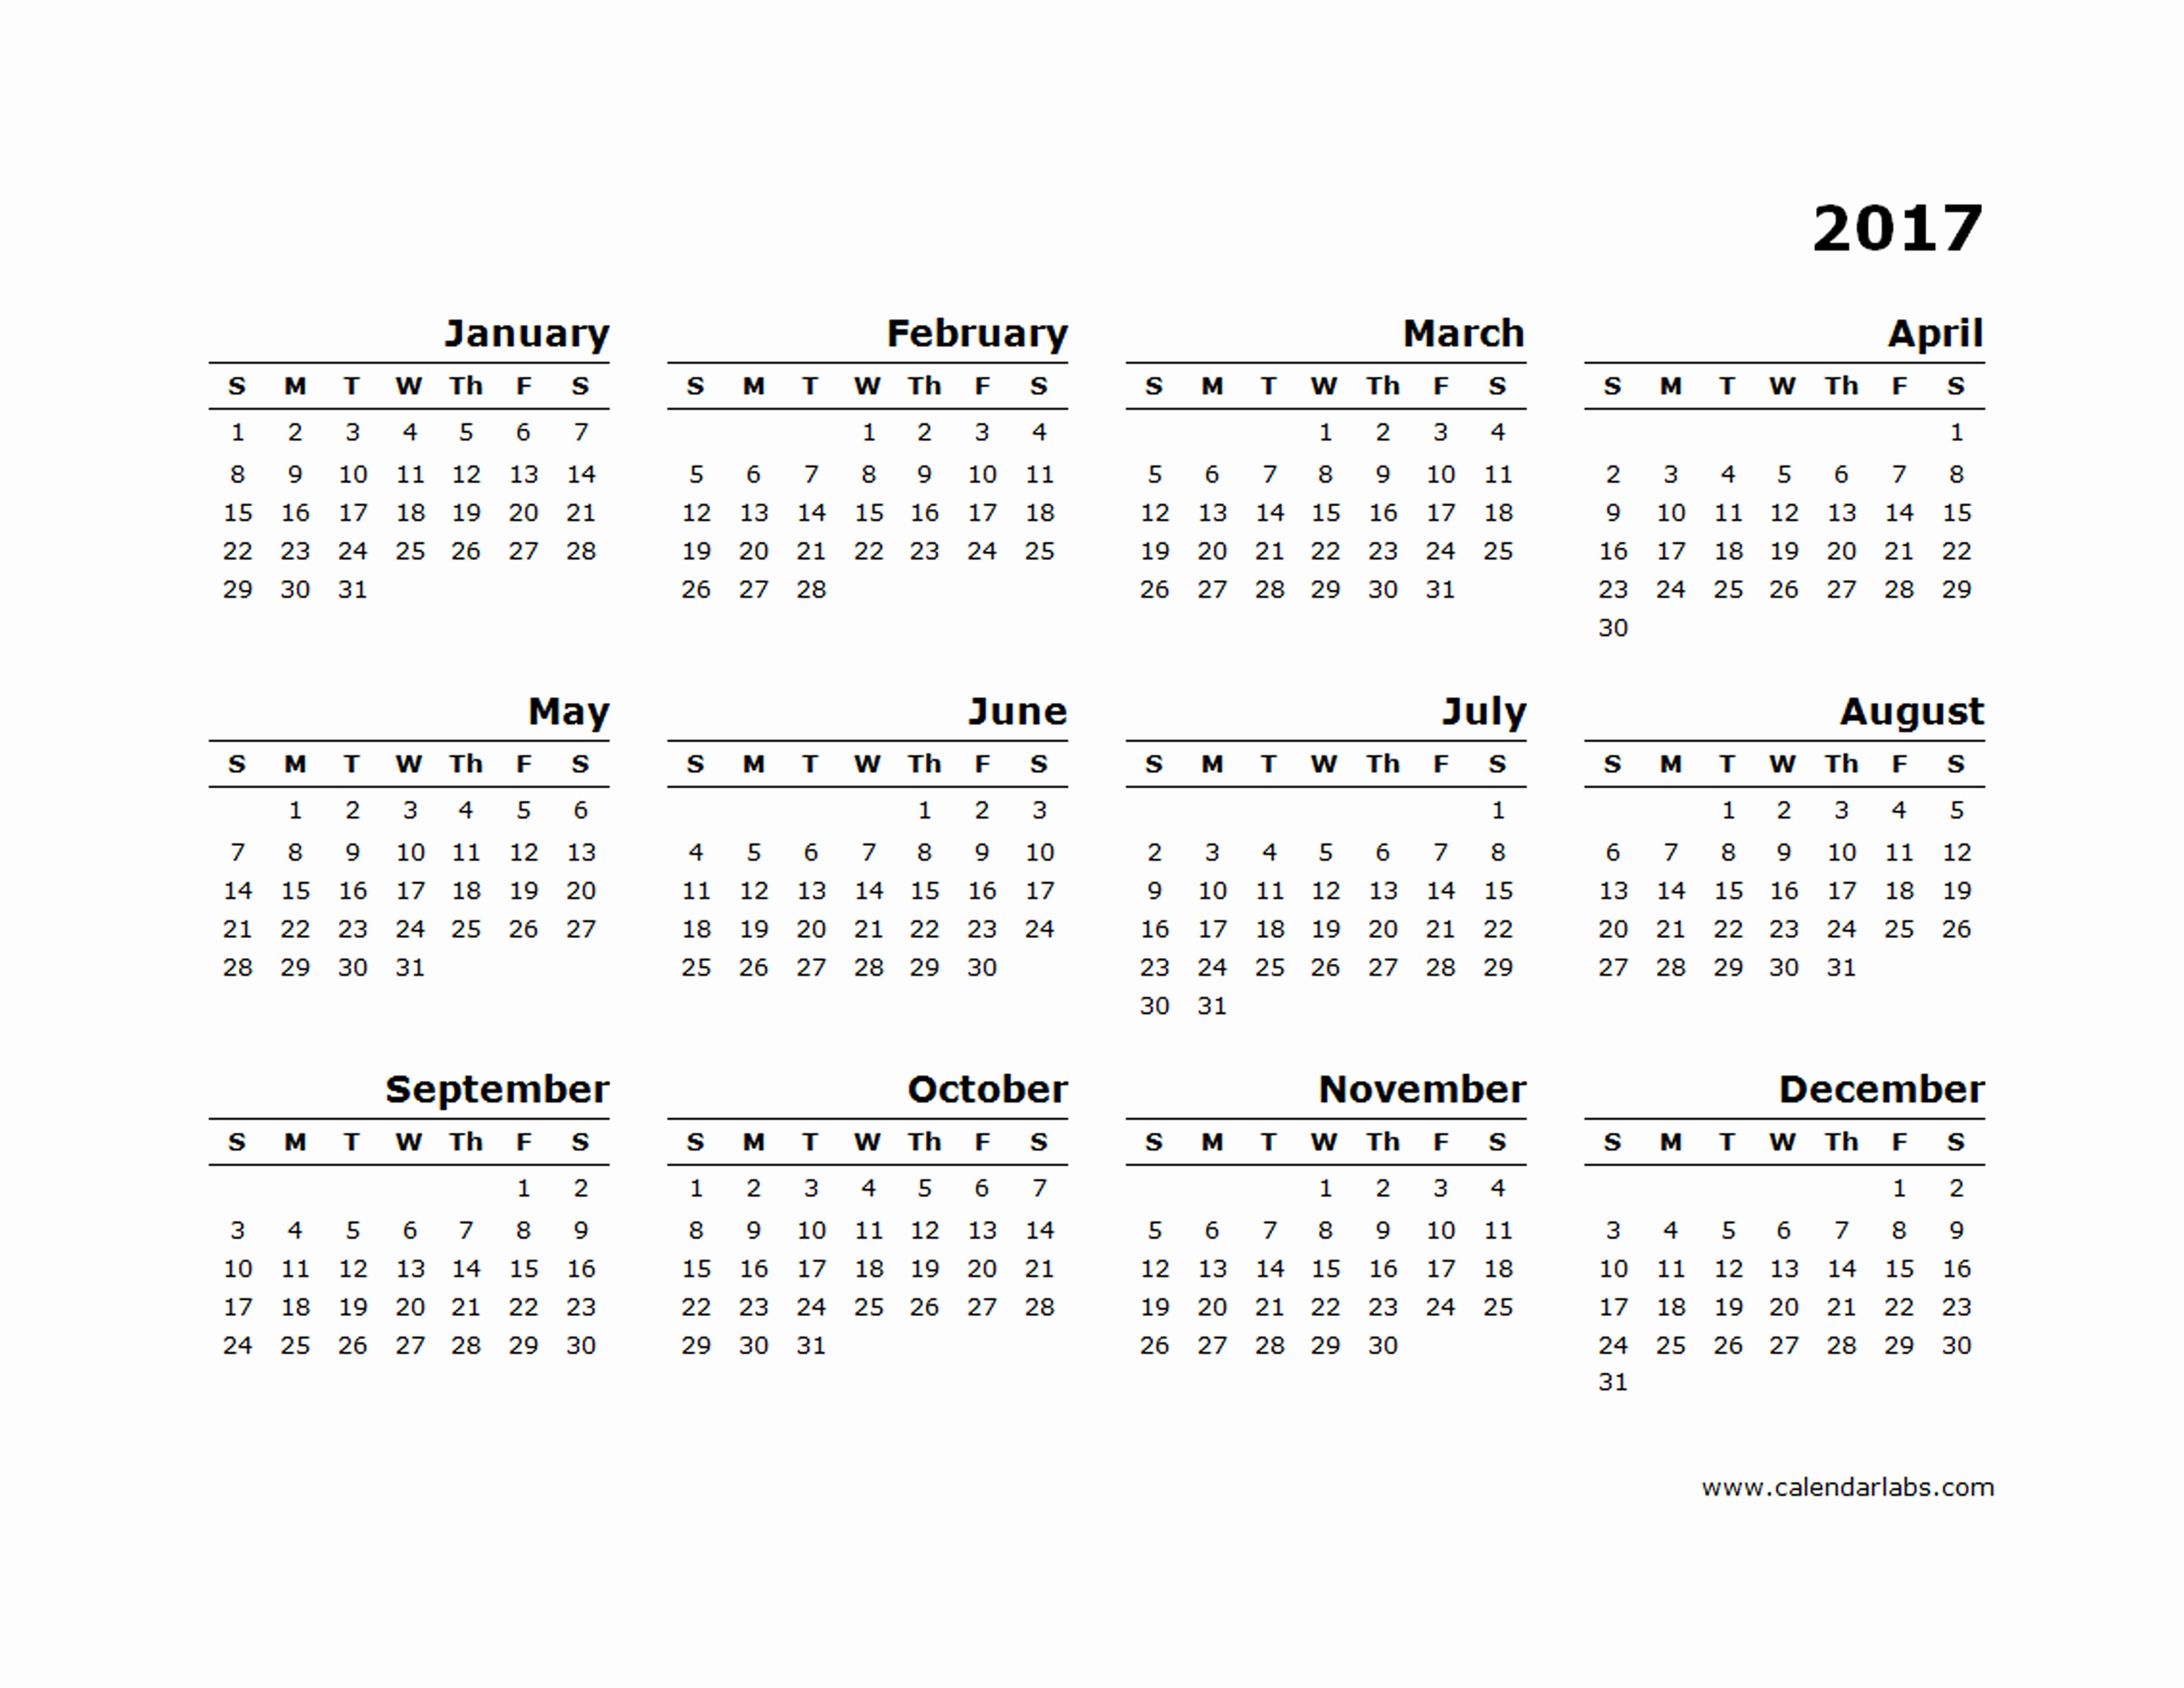 Free 2017 Yearly Calendar Template Elegant 2017 Yearly Calendar Blank Minimal Design Free Printable